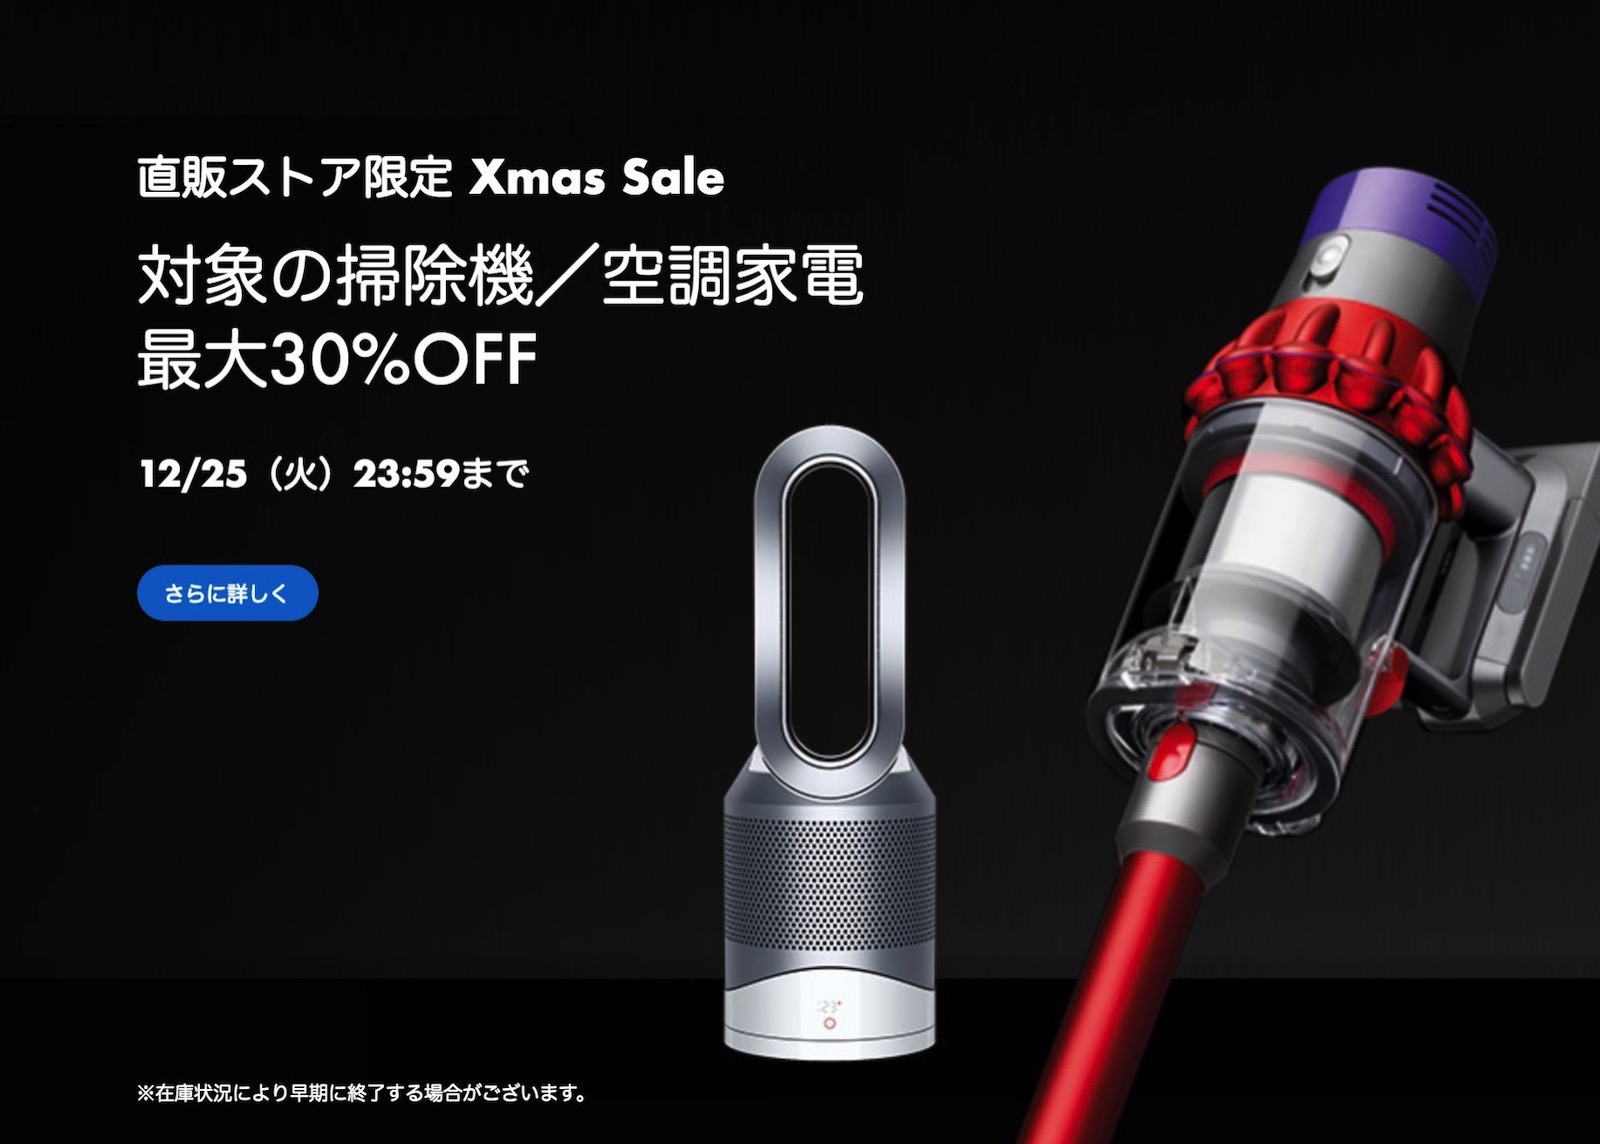 Dyson-Xmas-Sale.jpg